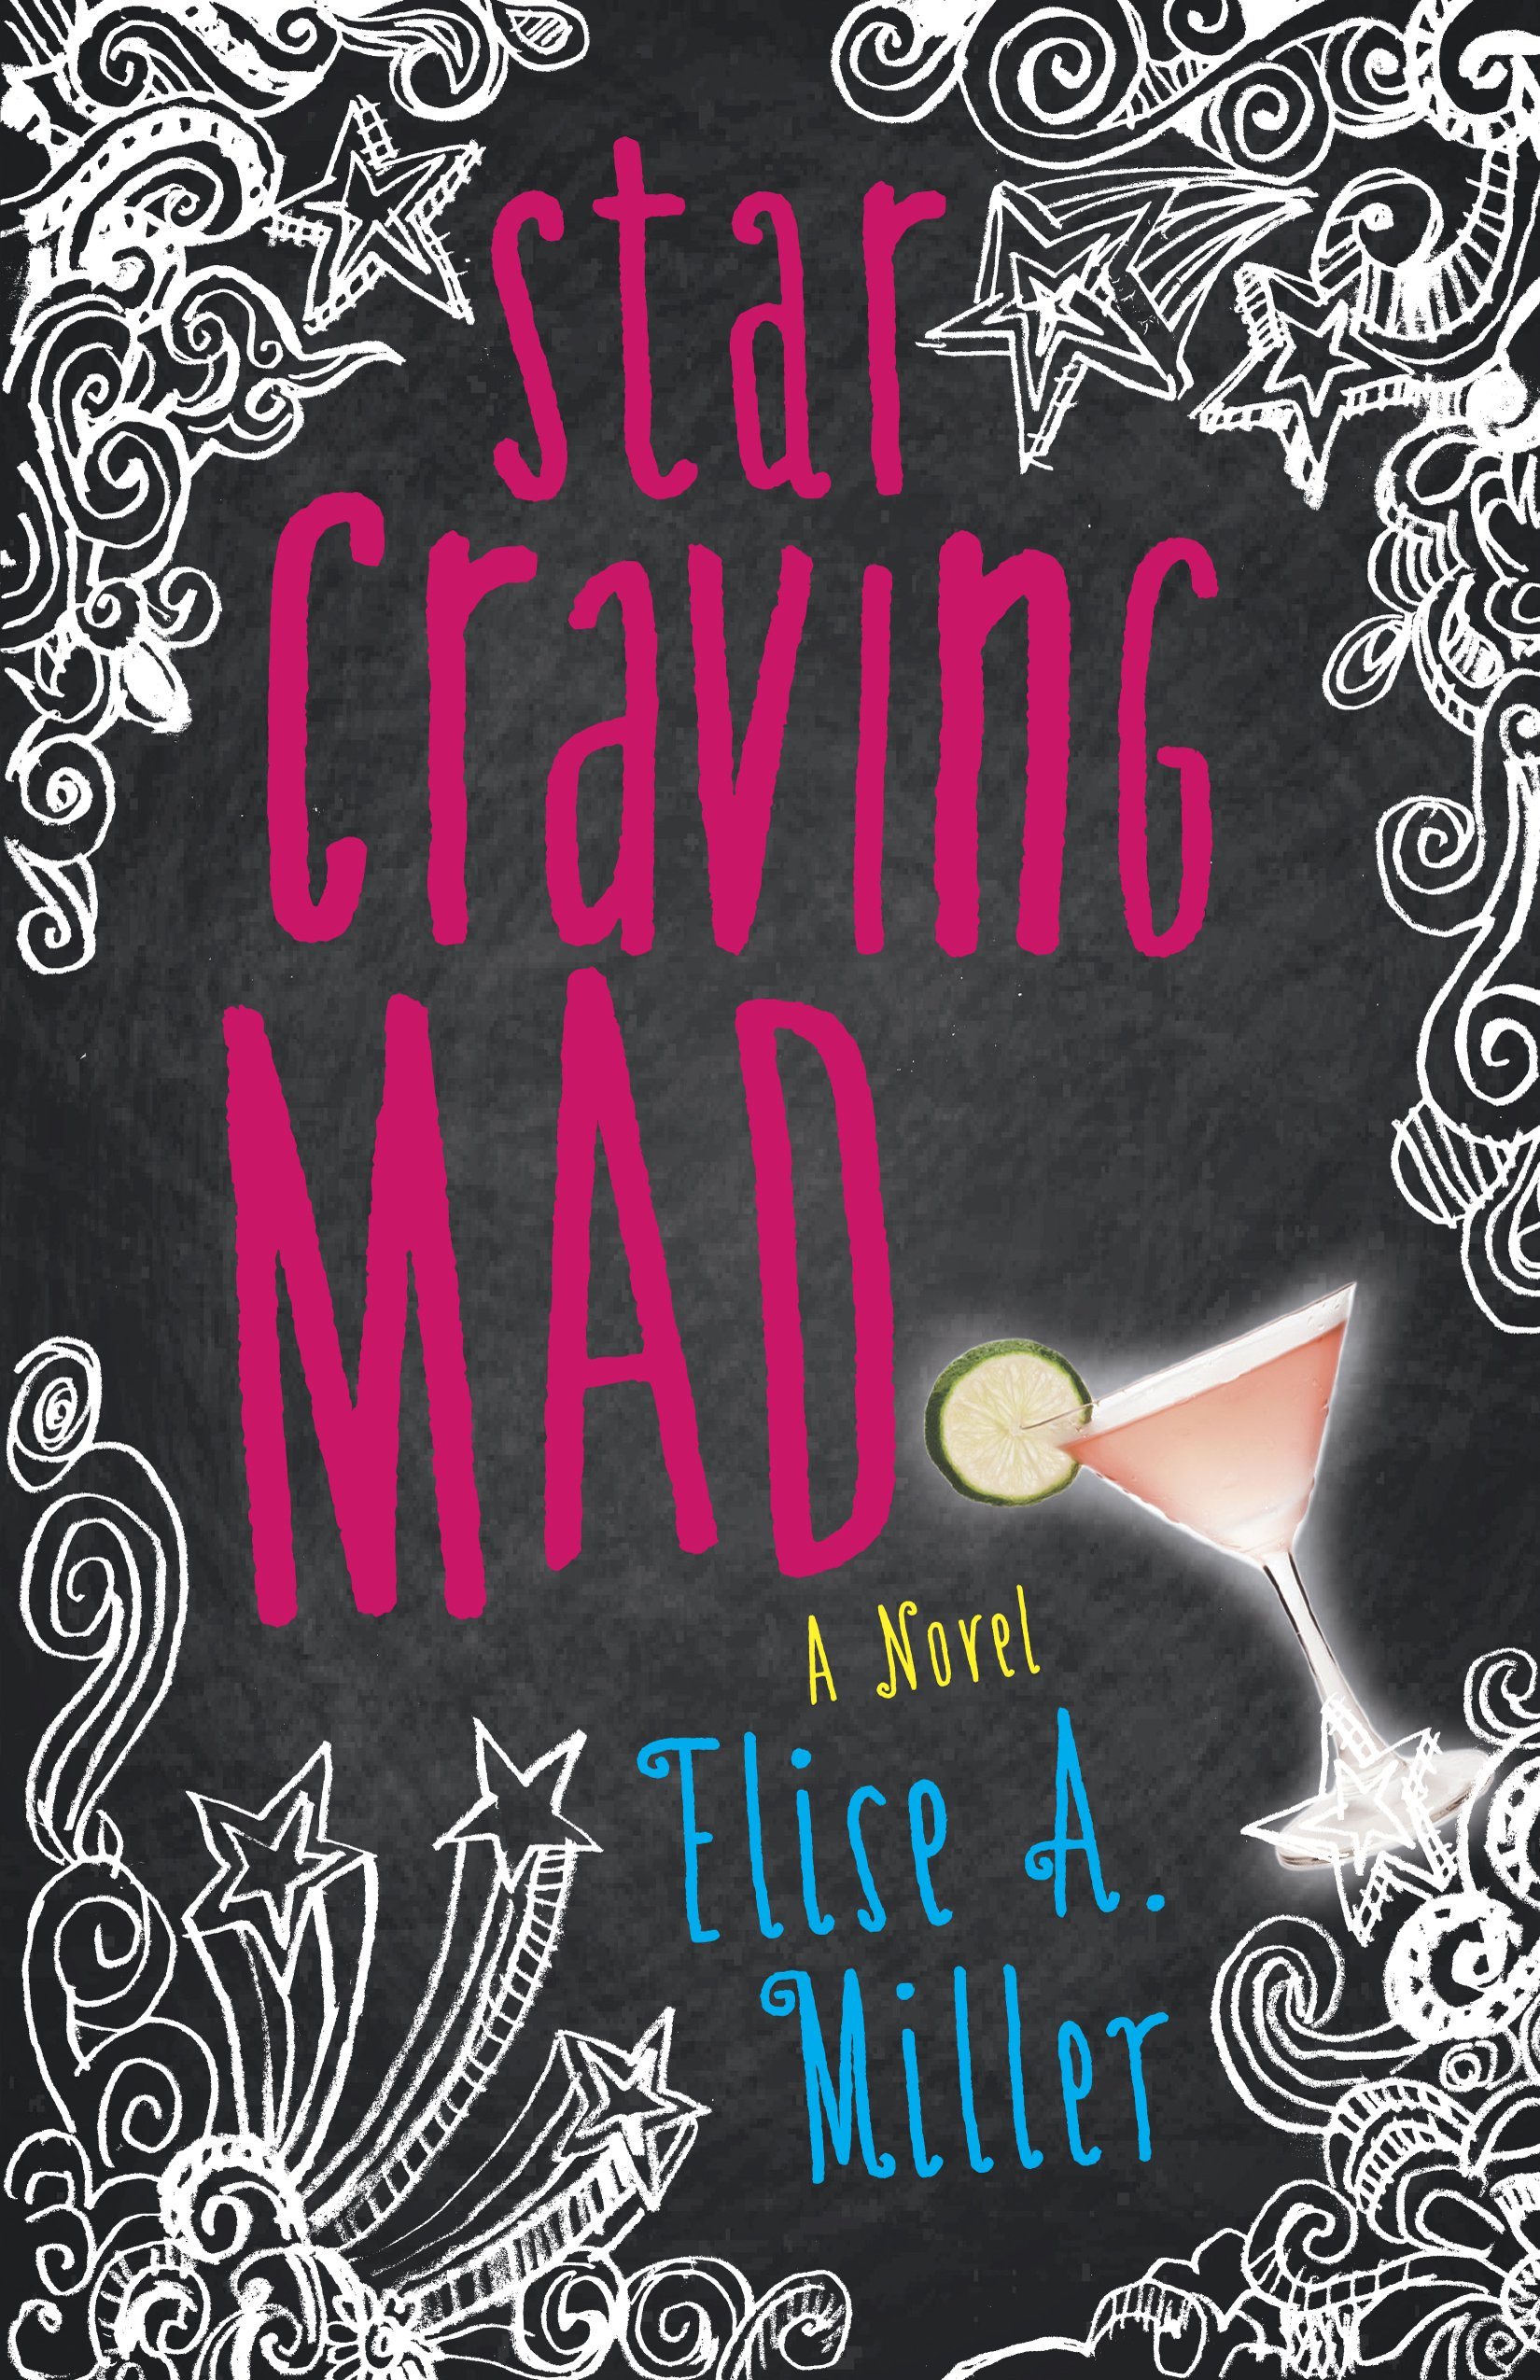 Star Craving Mad: A Novel: Elise Miller: 9781940716732: Amazon: Books